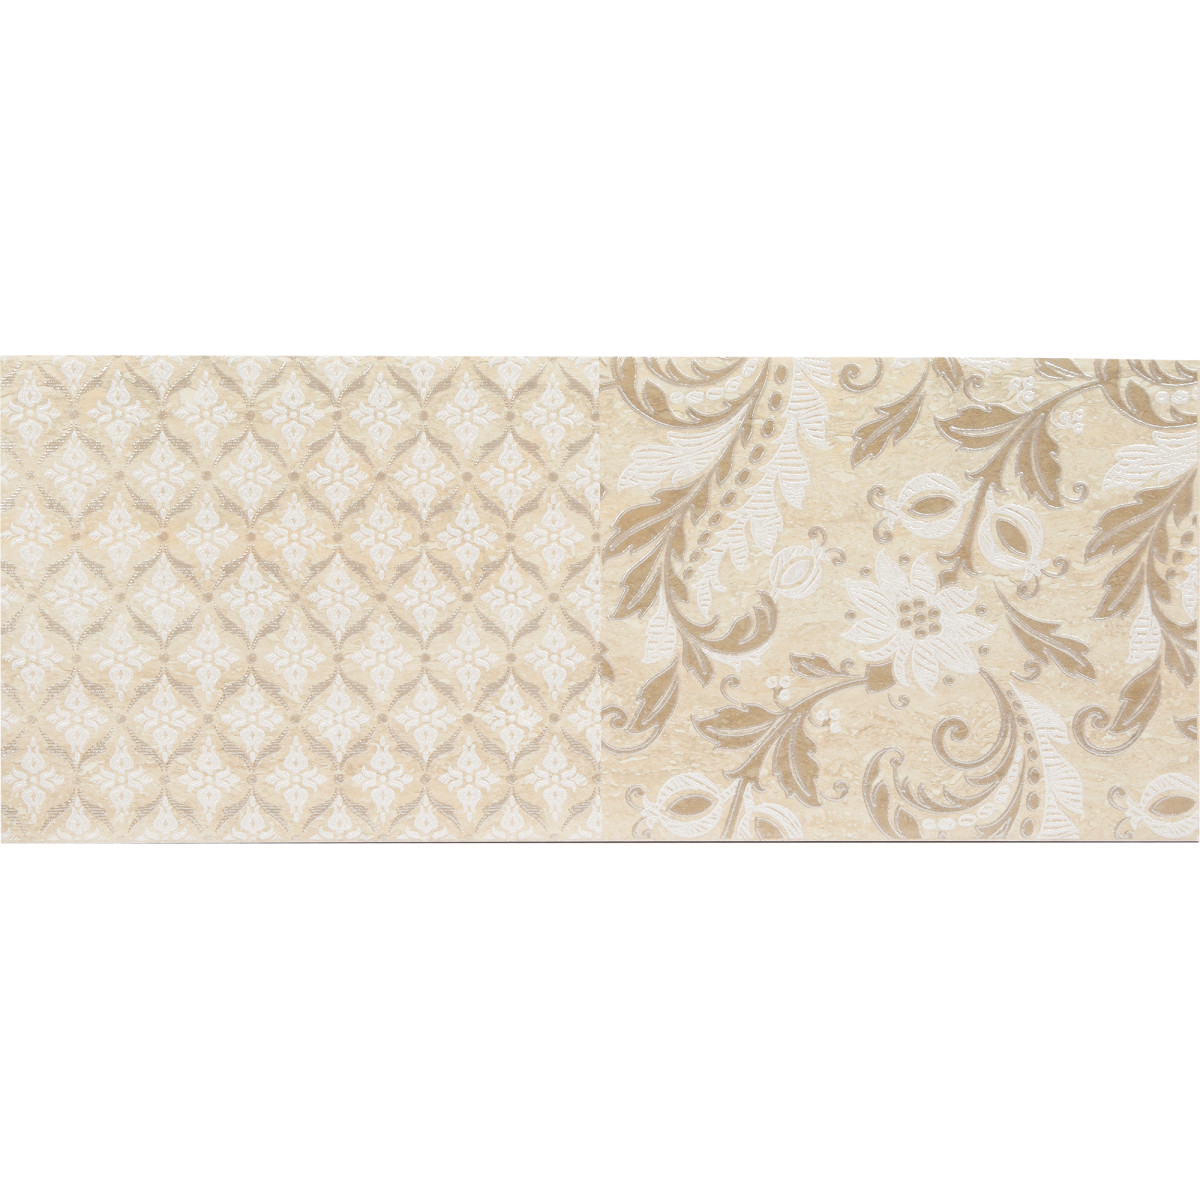 Декор «Marmi Classic 1» 20.1х50.5 см цвет бежевый